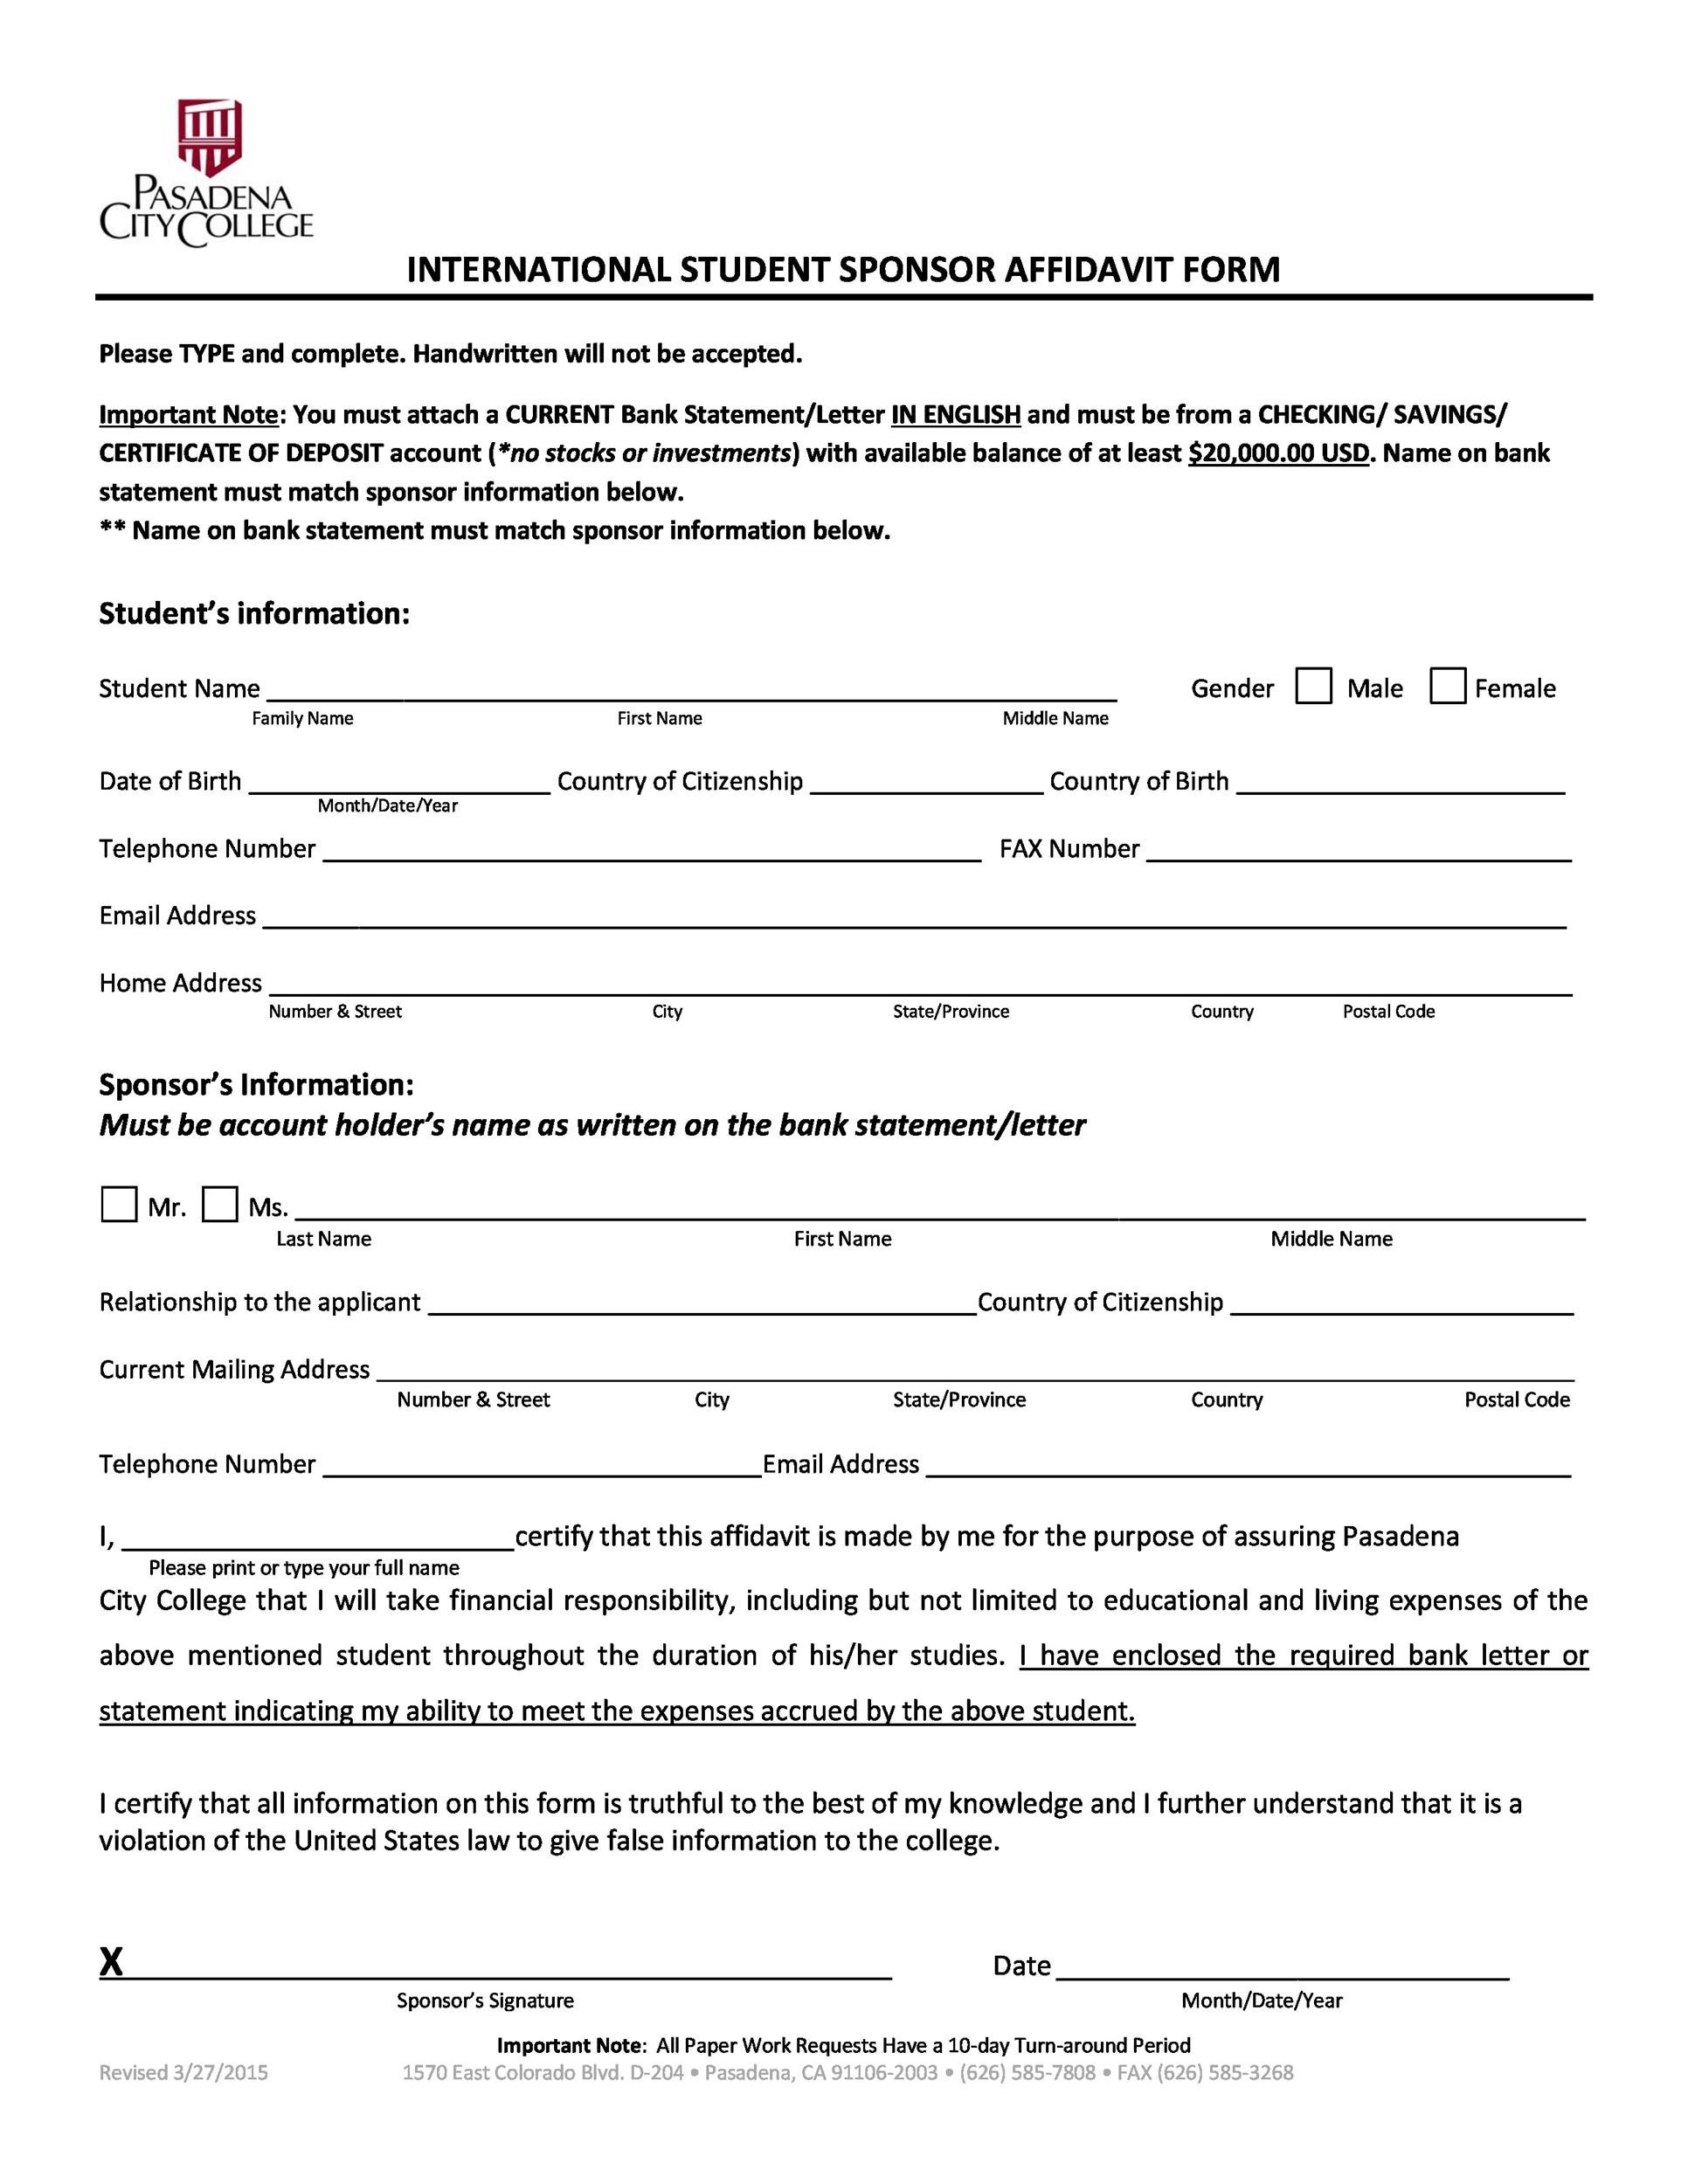 Free affidavit form 42